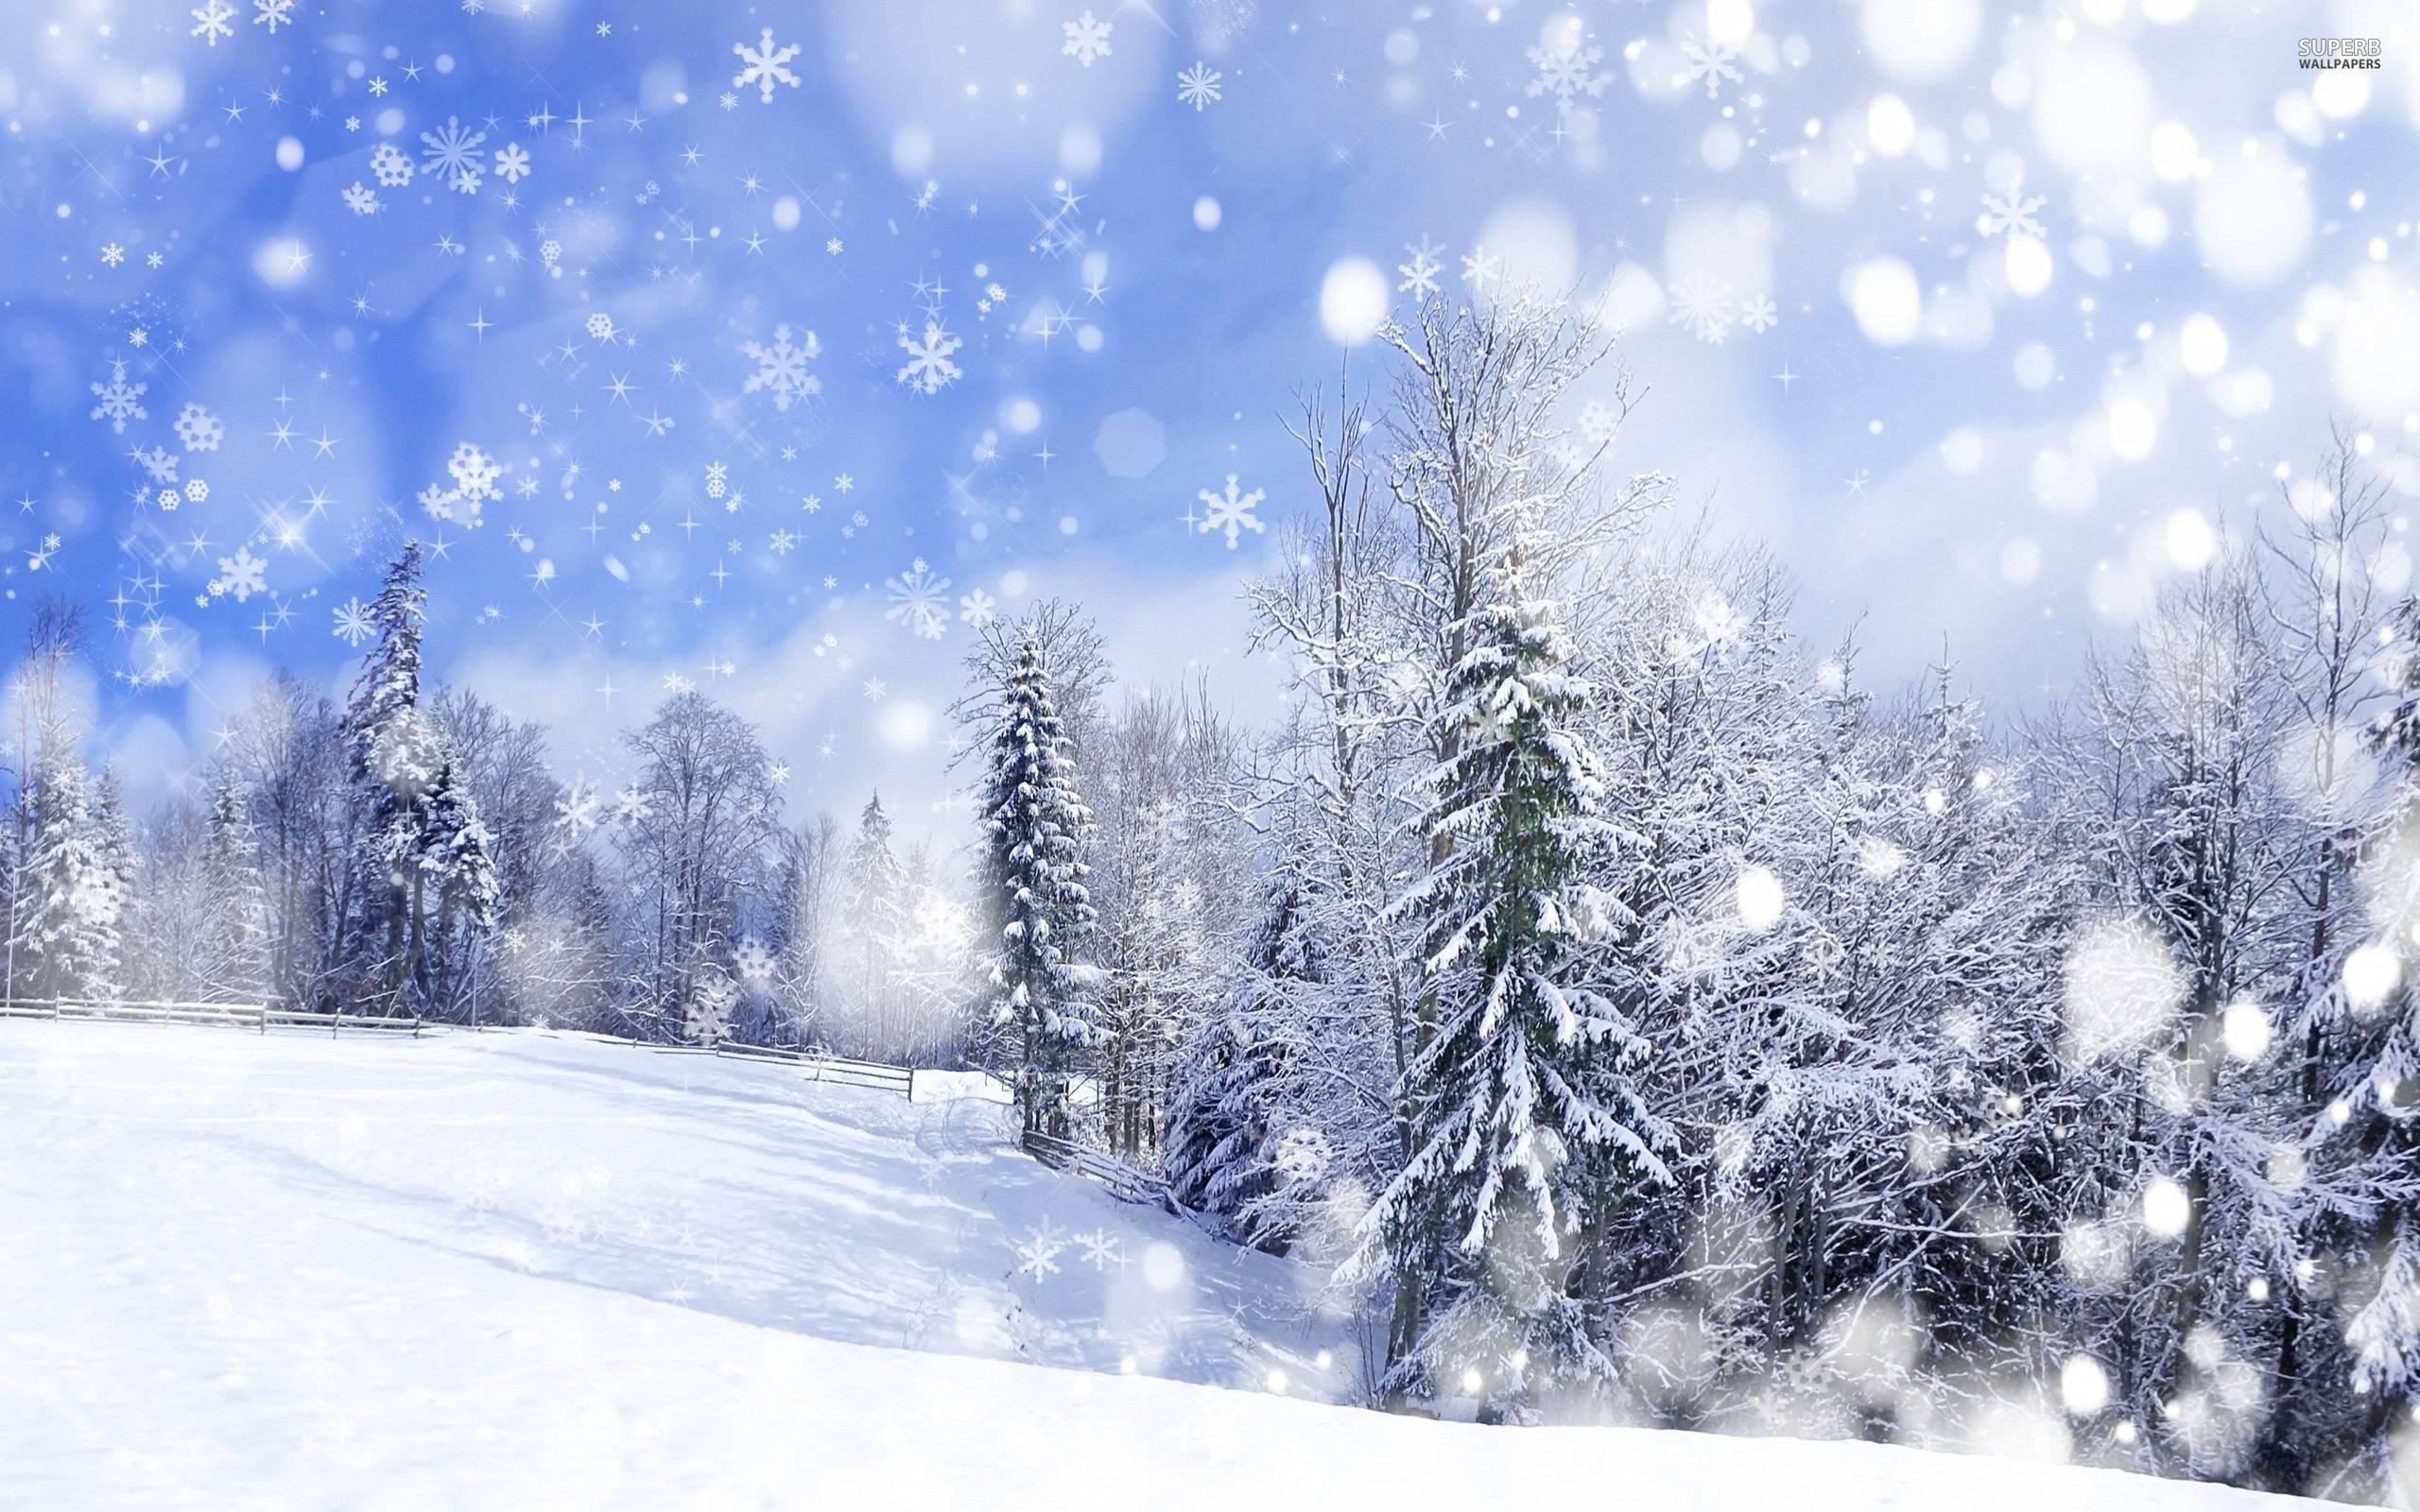 Snowfall Snowfall 2560x1600